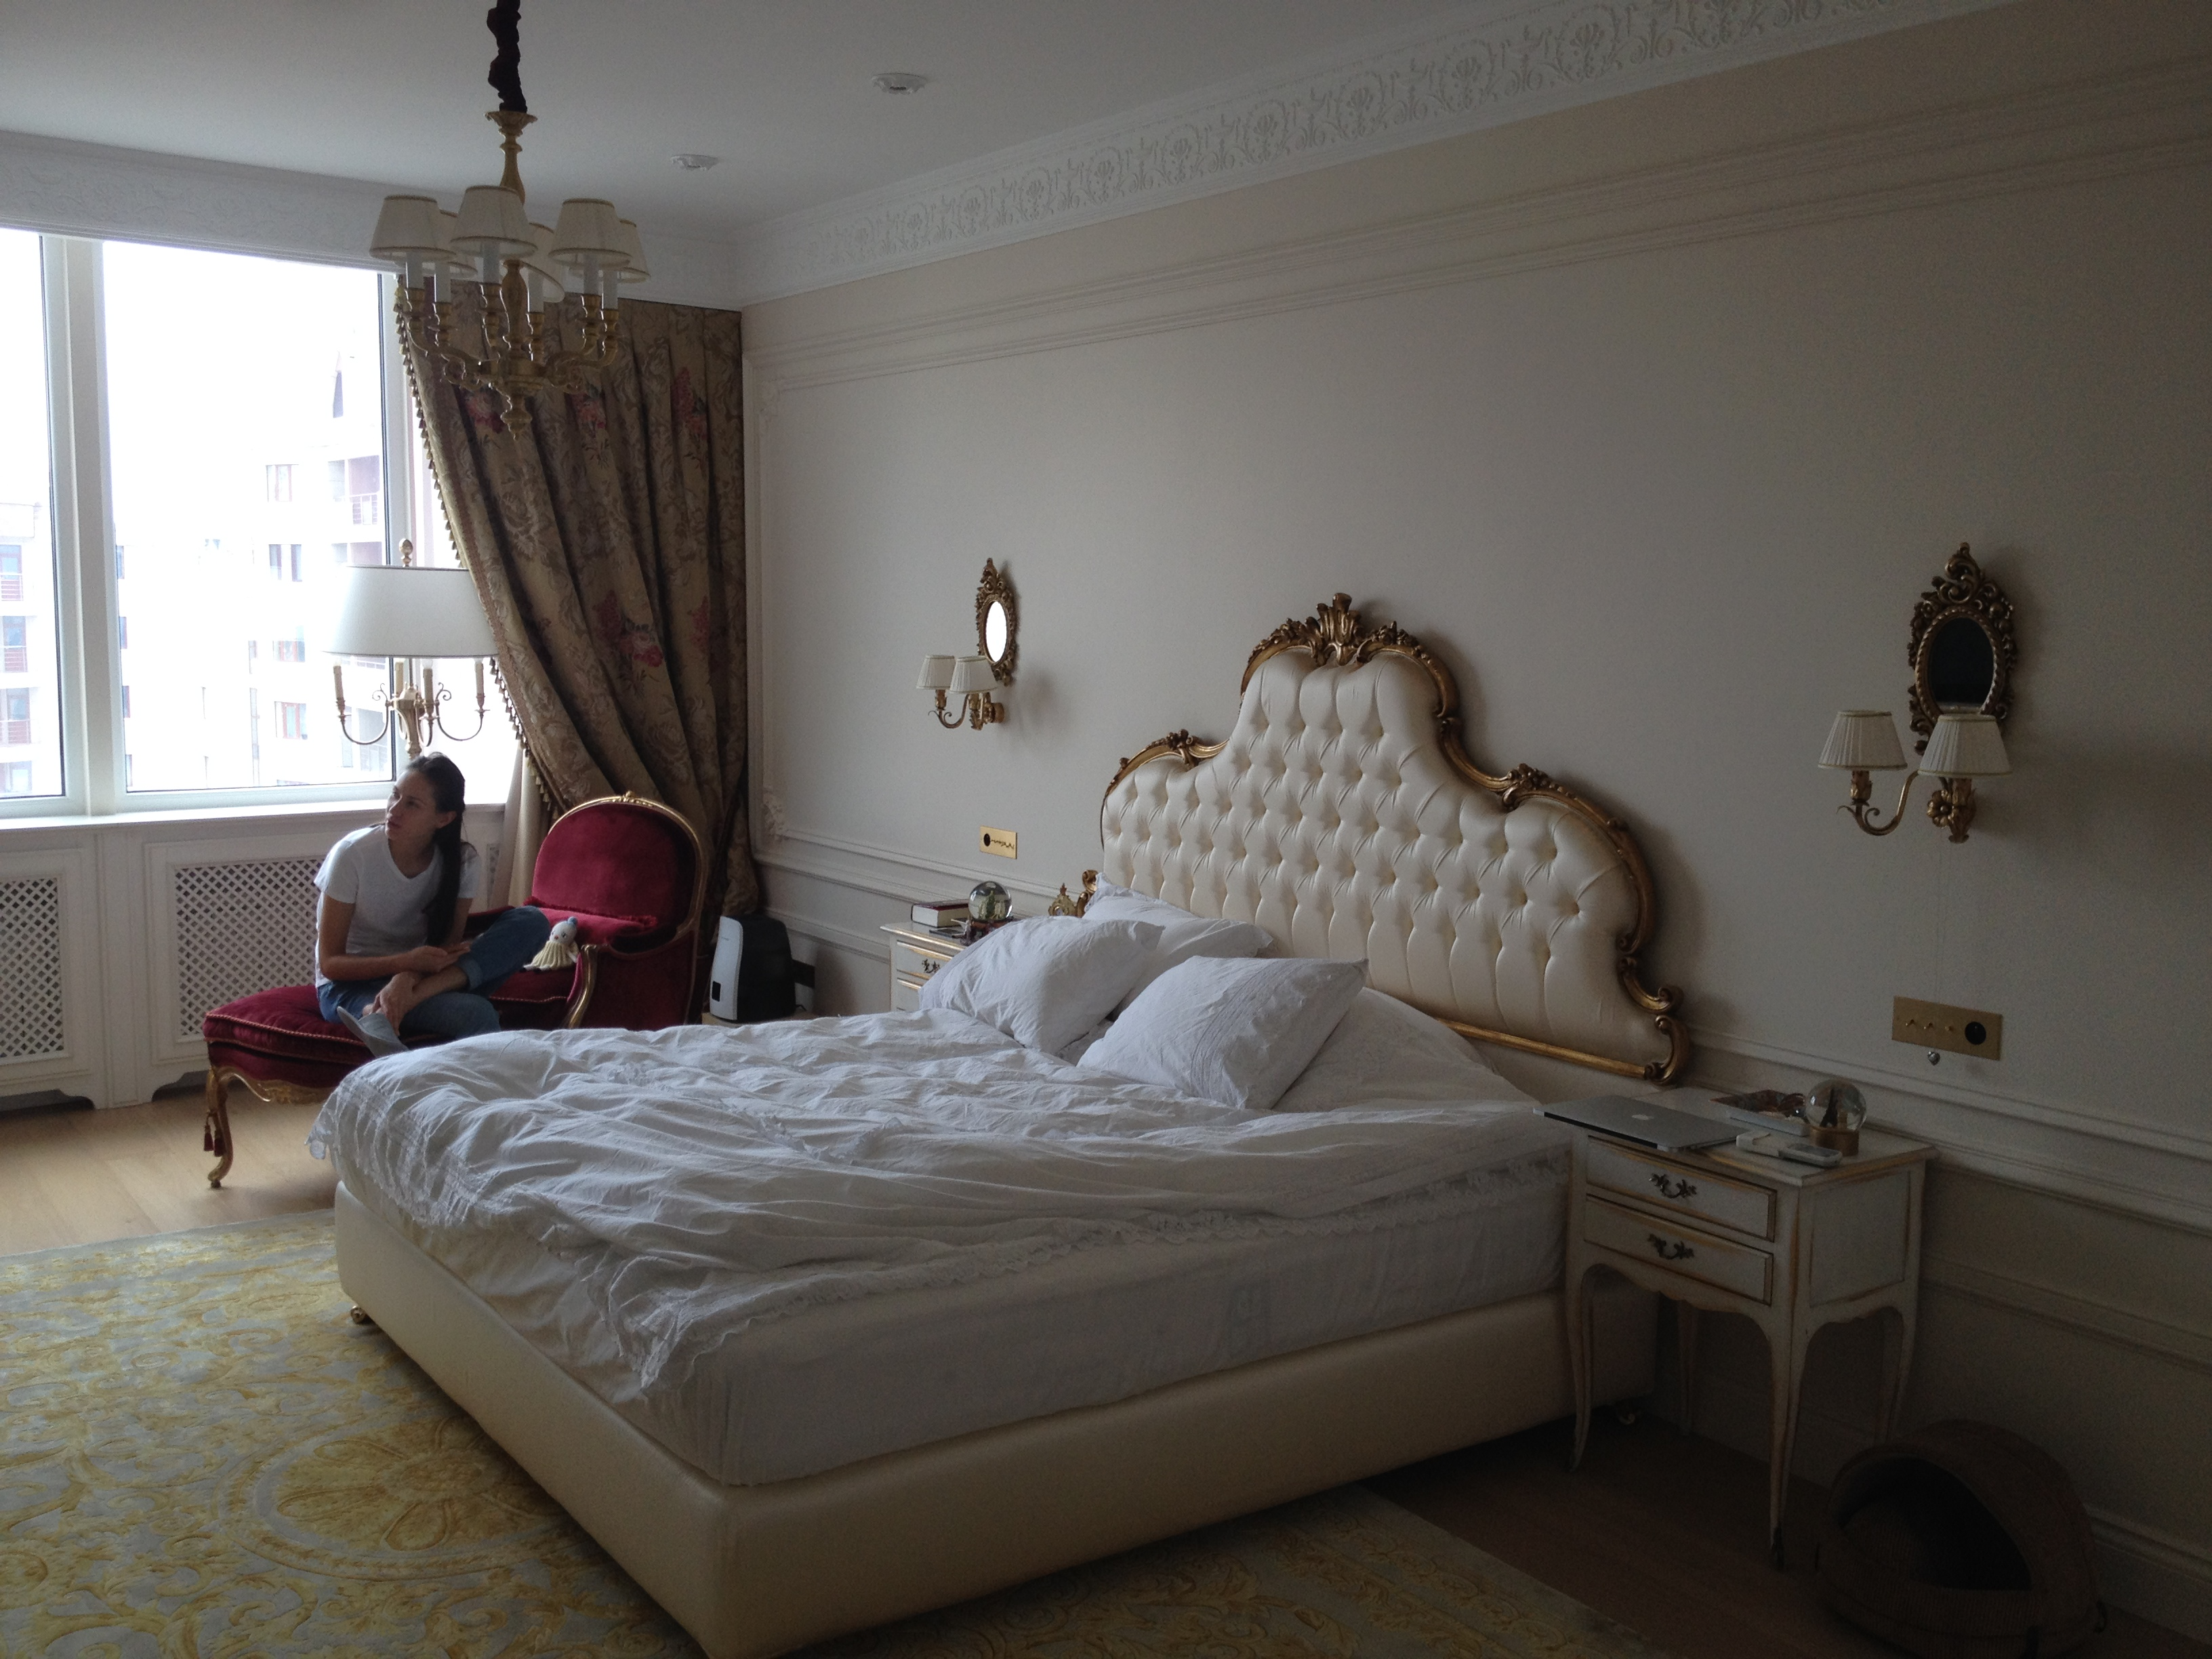 Bedroom alive